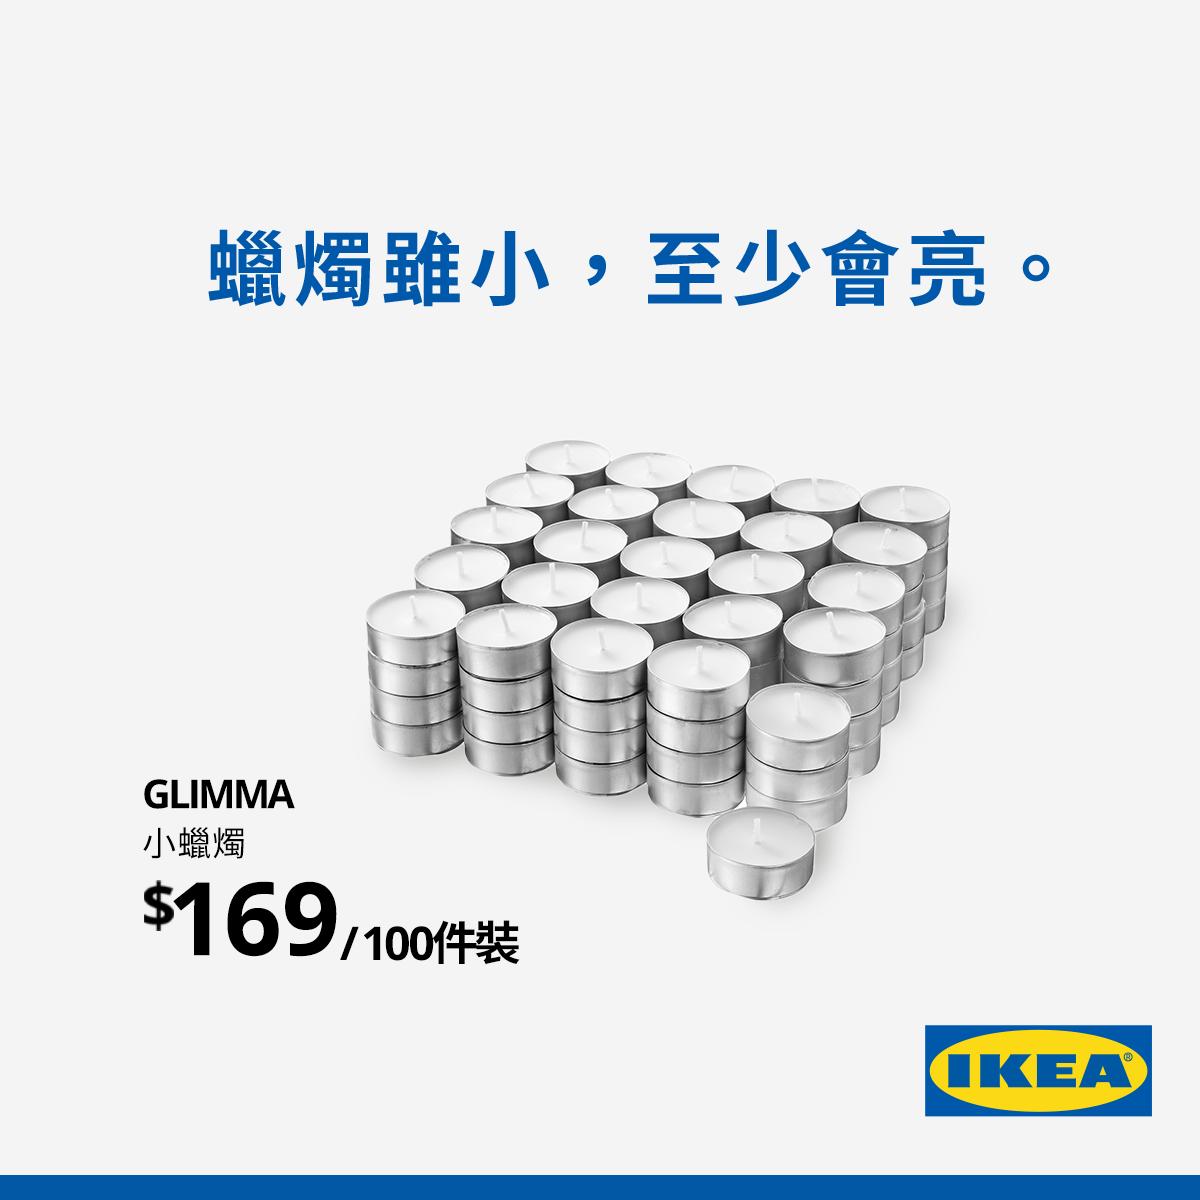 IKEA在昨日停電後,於臉書貼出創意宣傳文案:「蠟燭雖小,至少會亮。」(翻攝自IKEA臉書)